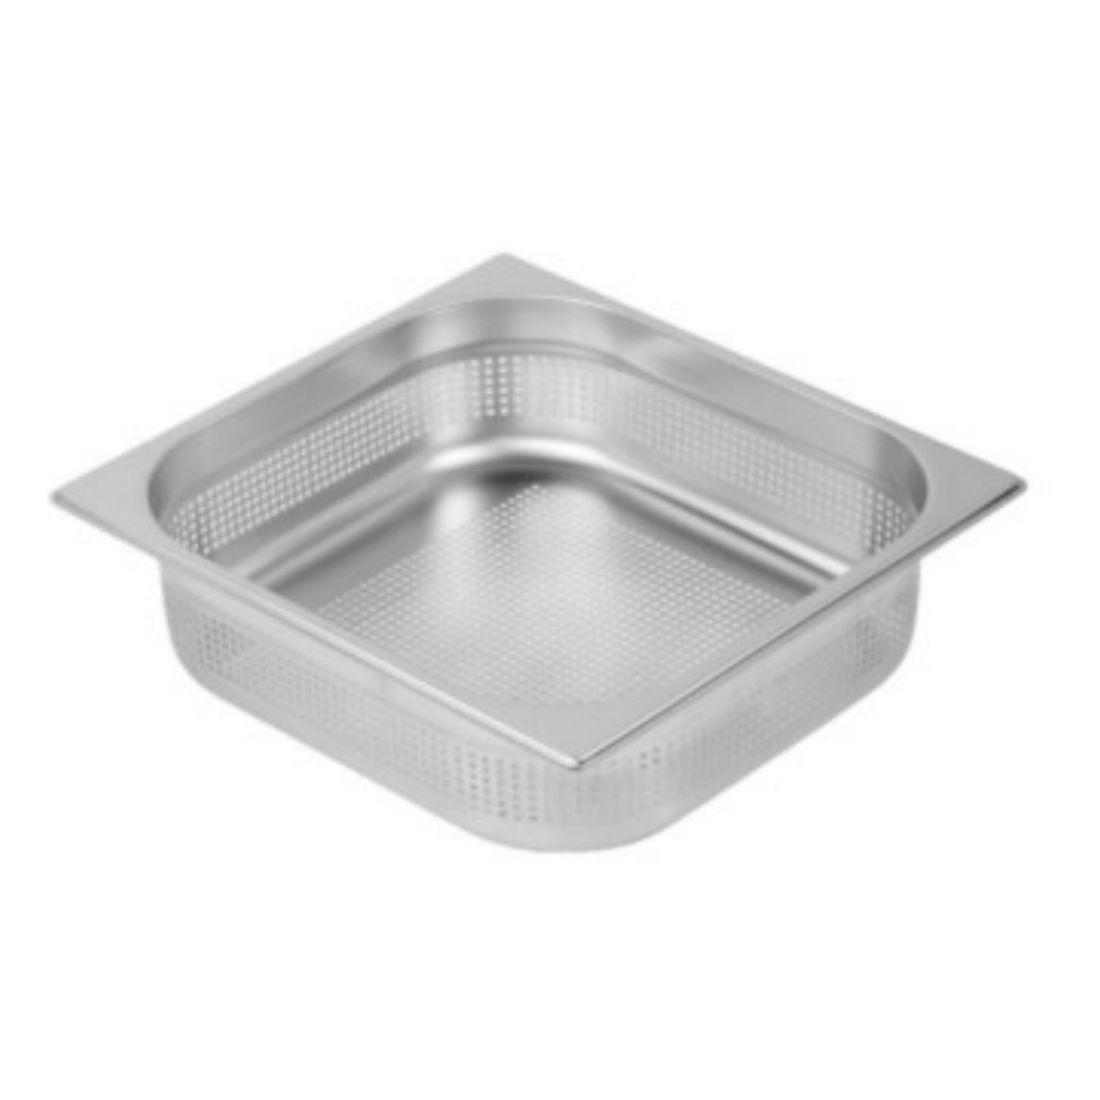 Gastronádoba Profi děrovaná GN 2/3 100 mm